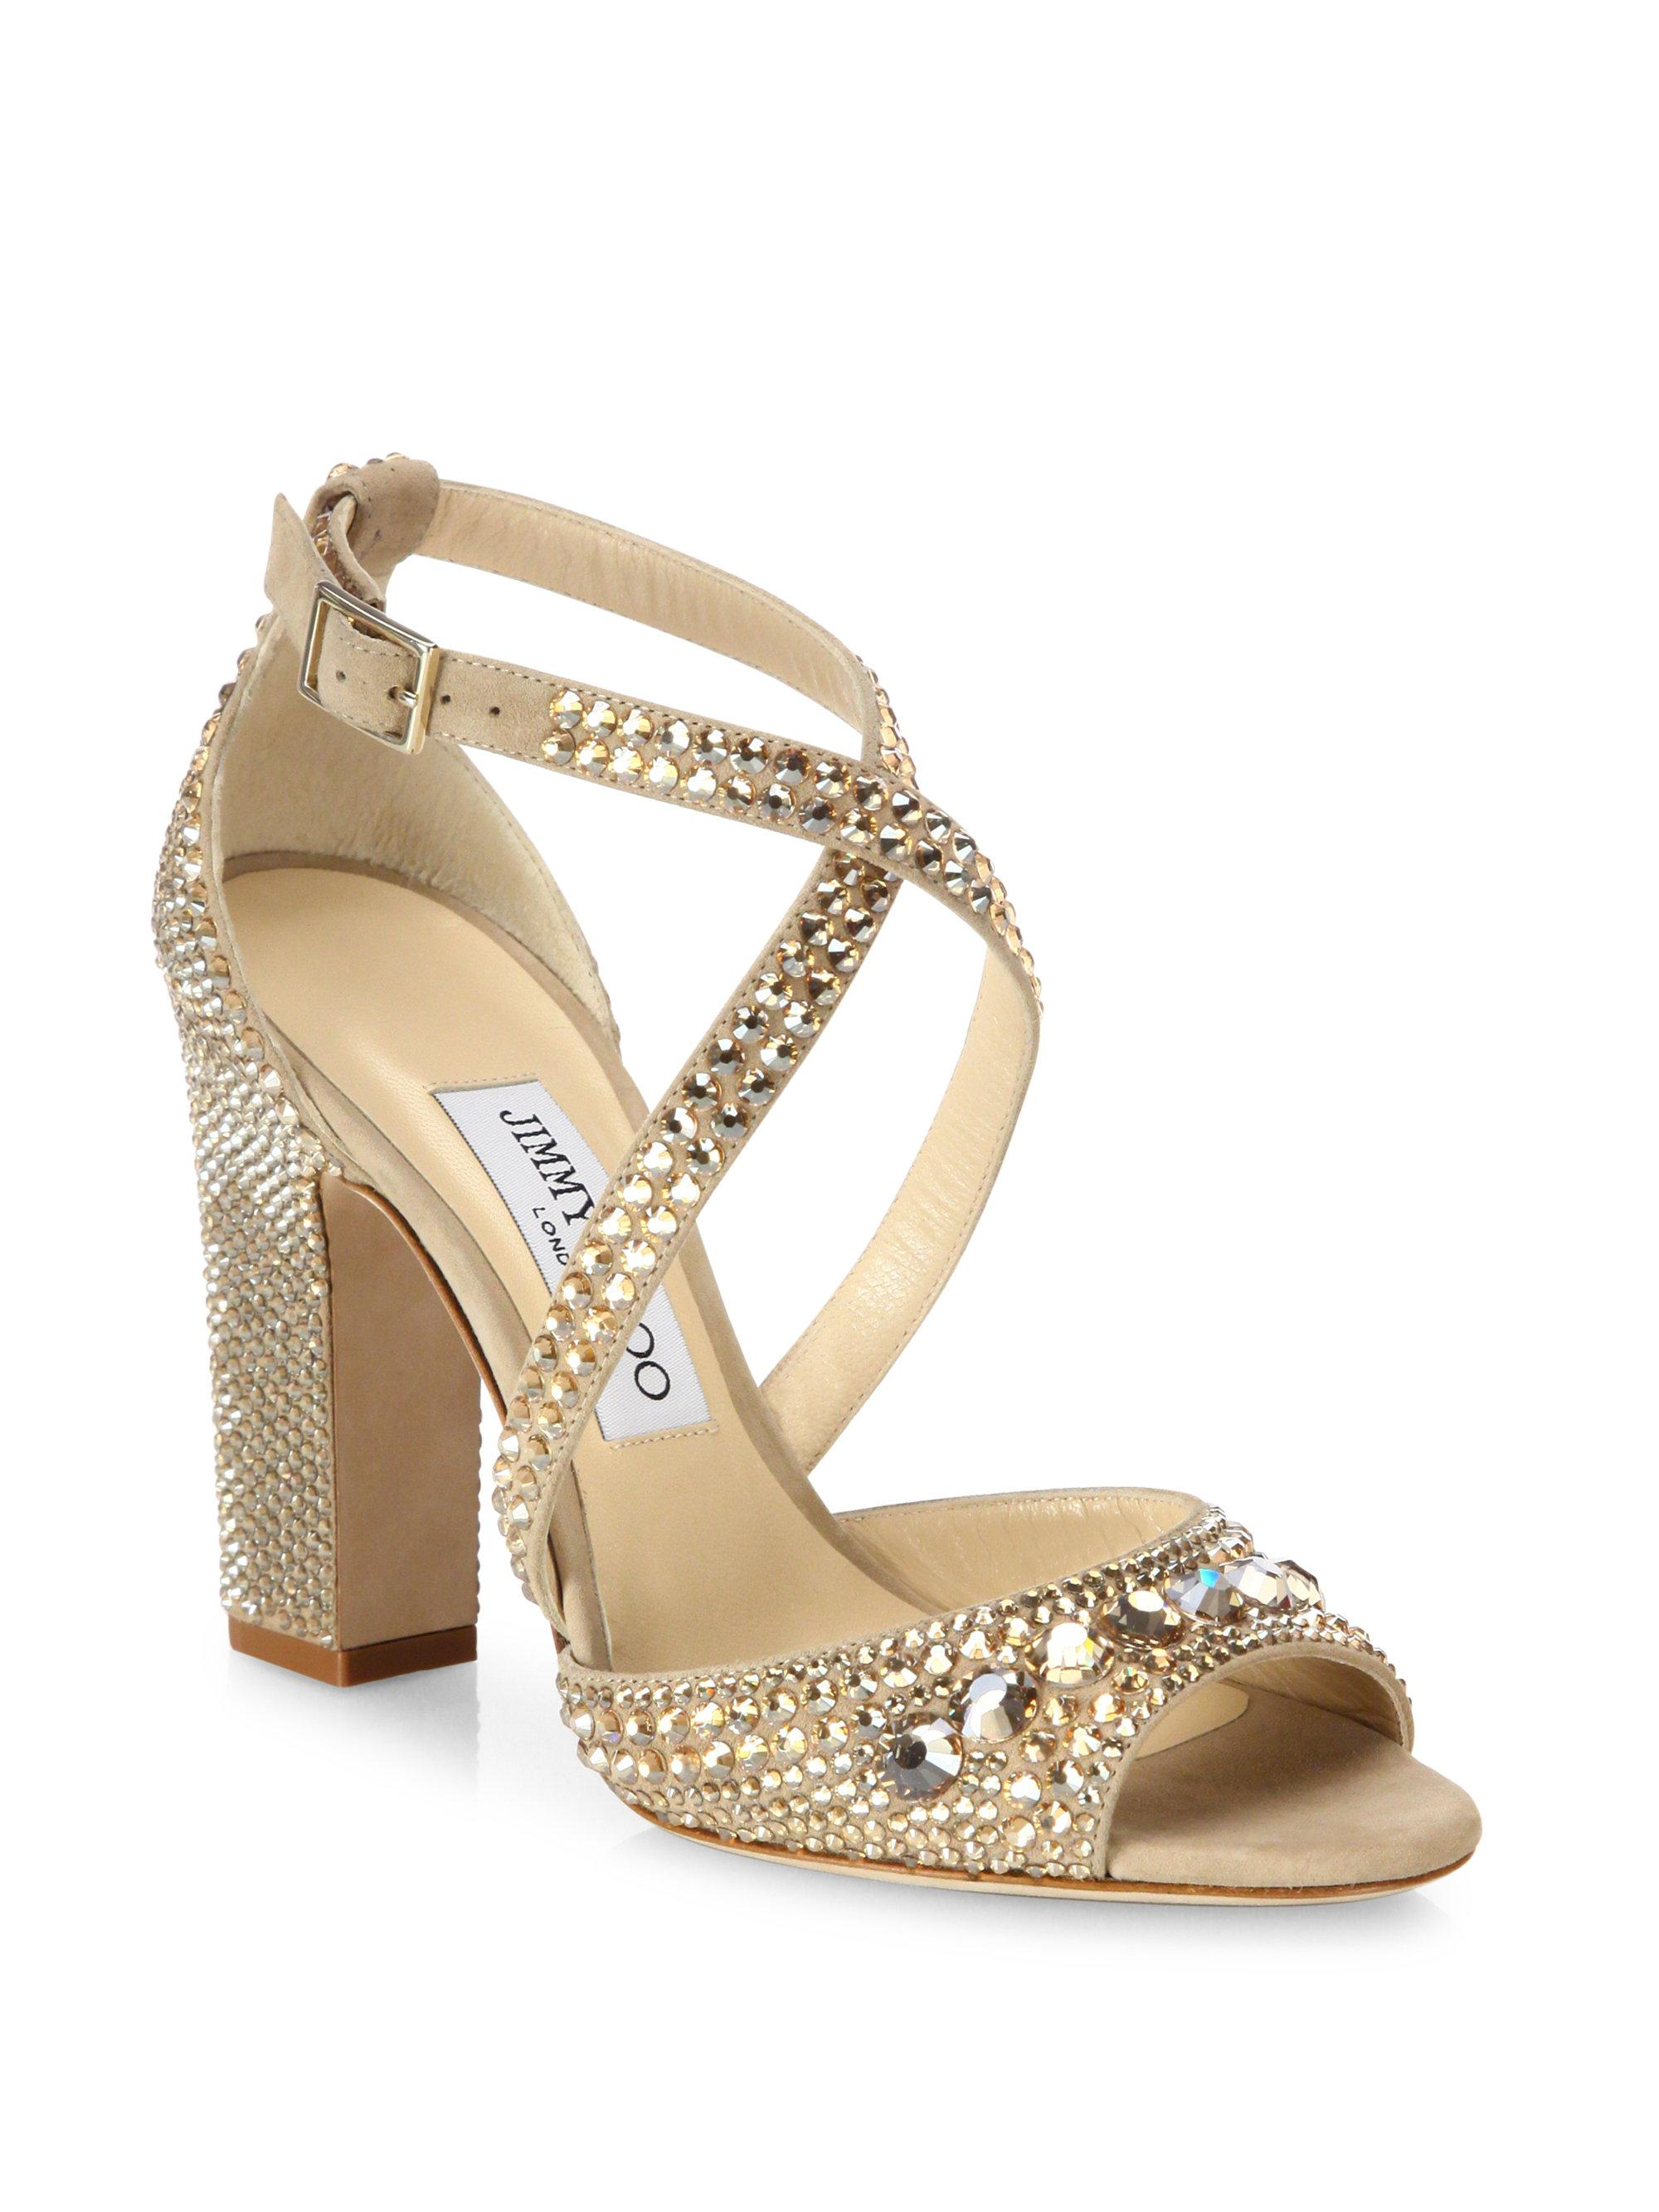 6a70d7574c5 Lyst - Jimmy Choo Carrie 100 Crystal-embellished Suede Block Heel ...